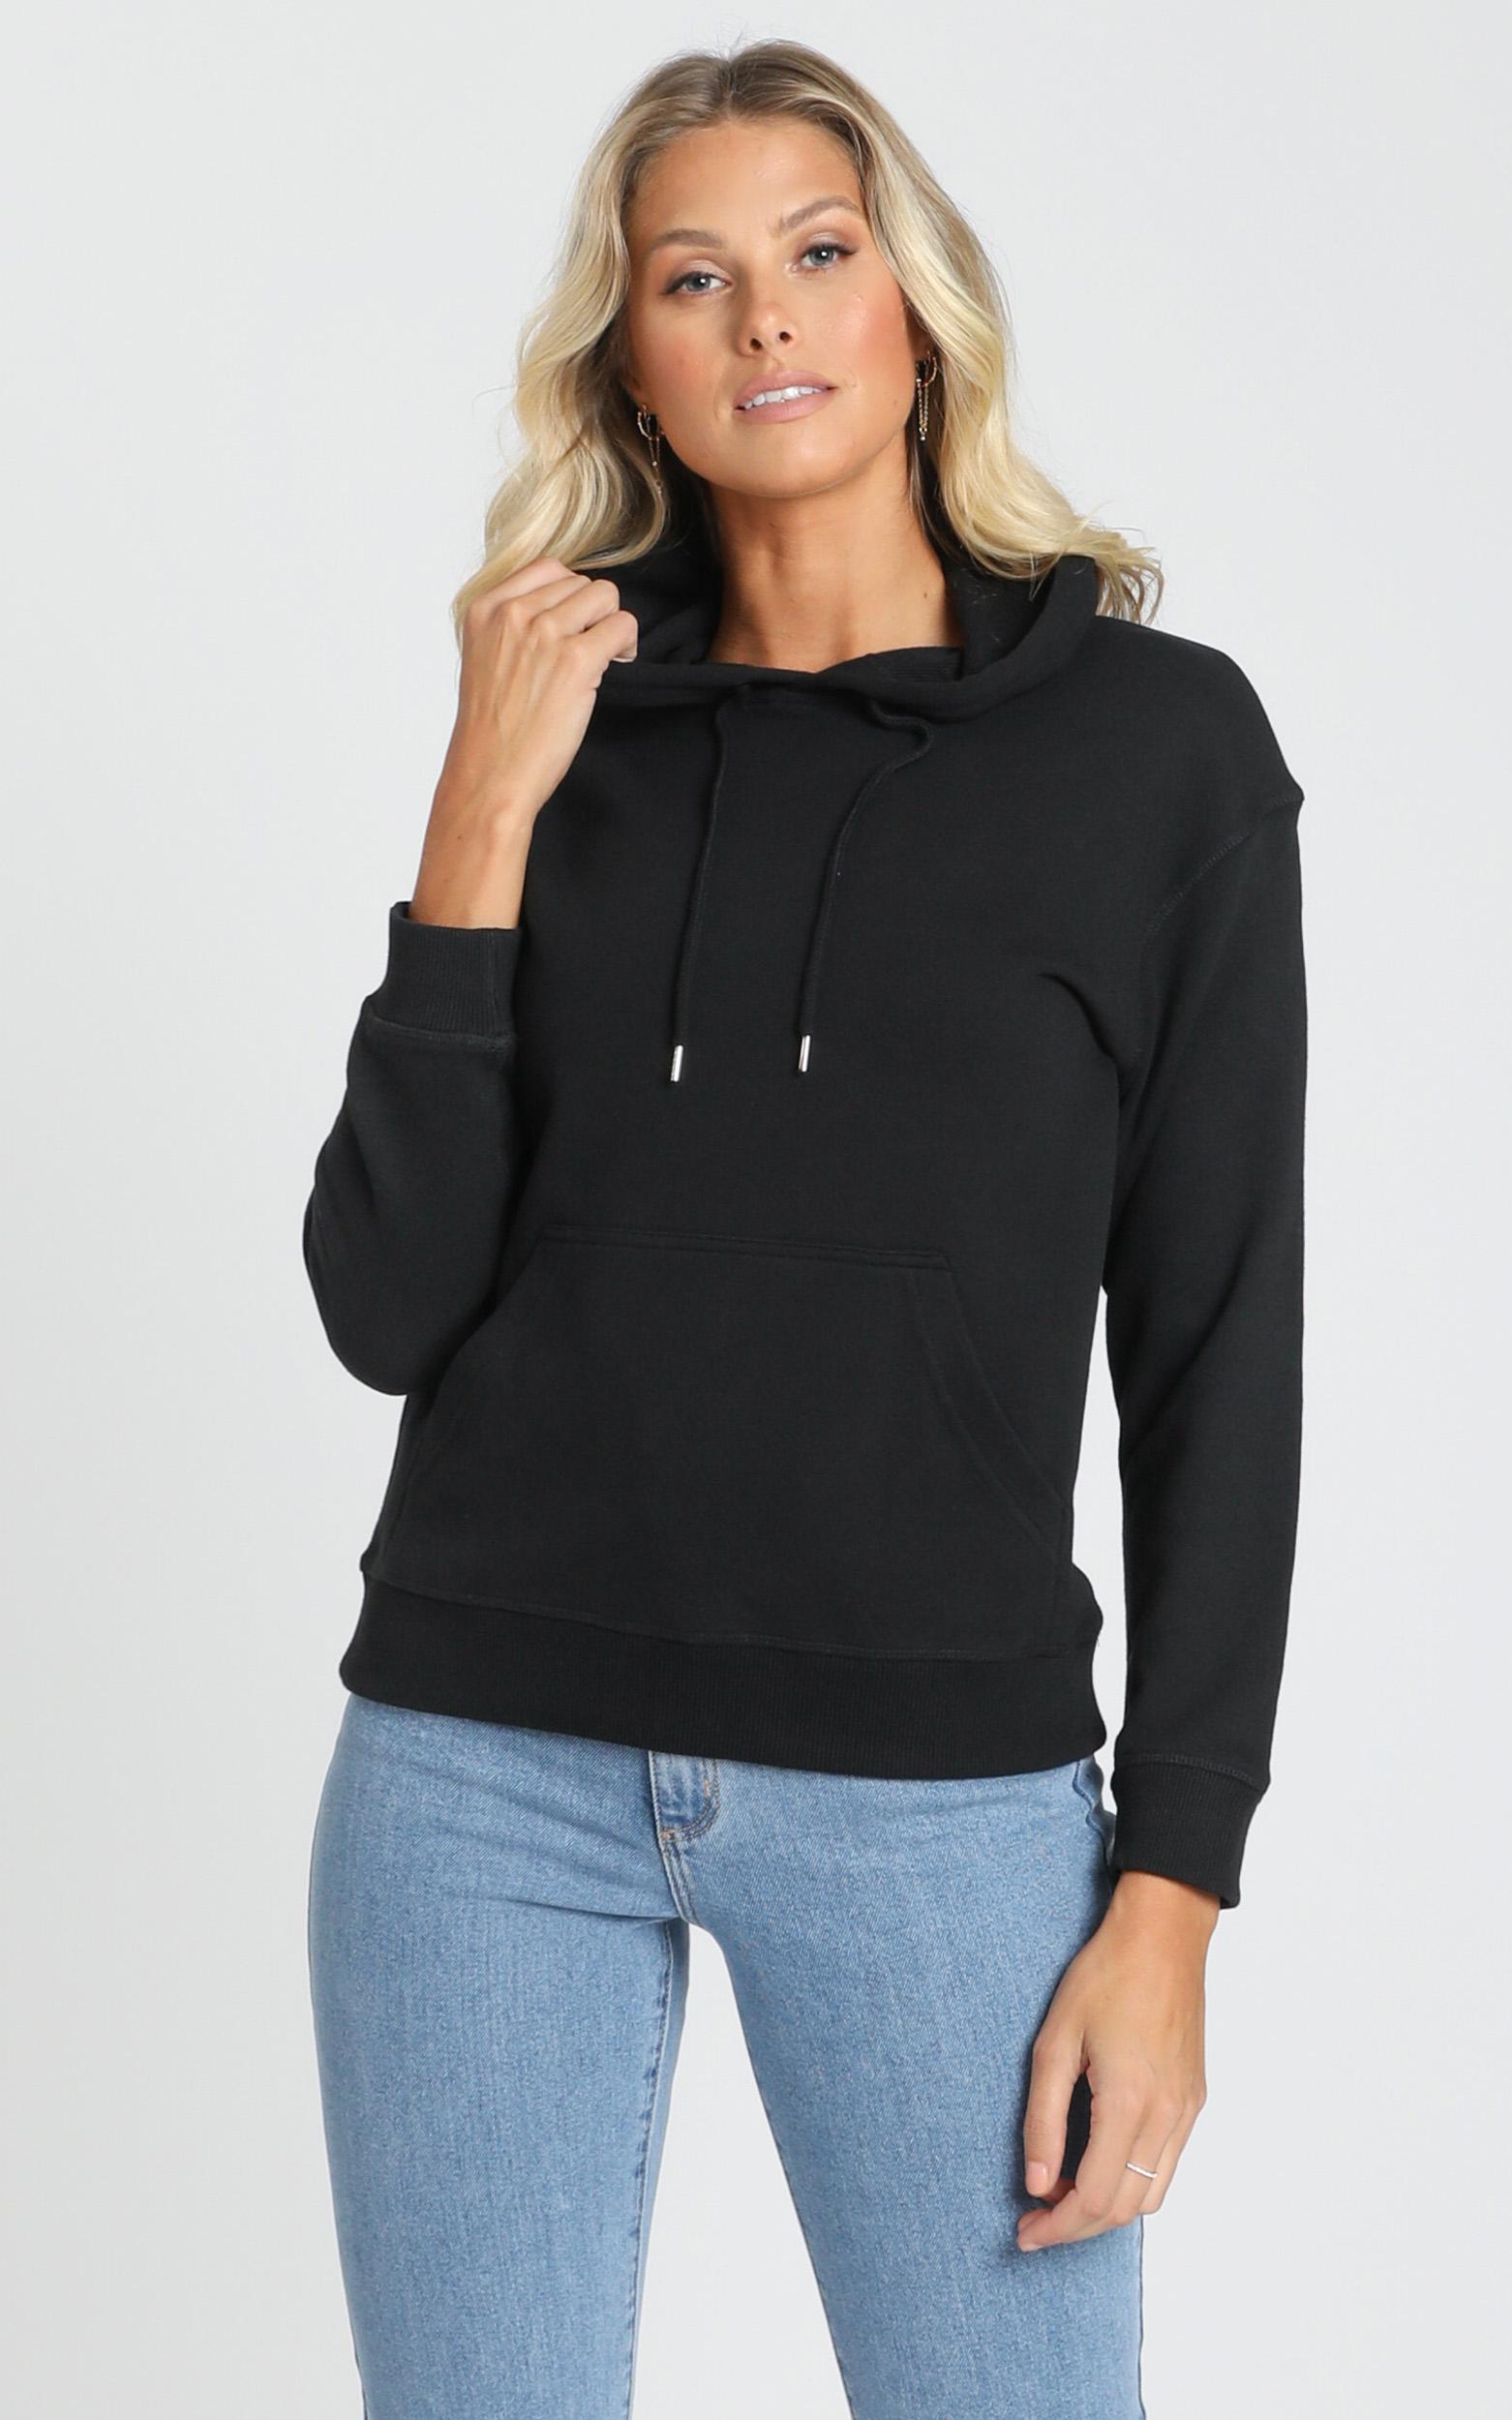 AS Colour - Premium Hood in Black - XS, Black, hi-res image number null